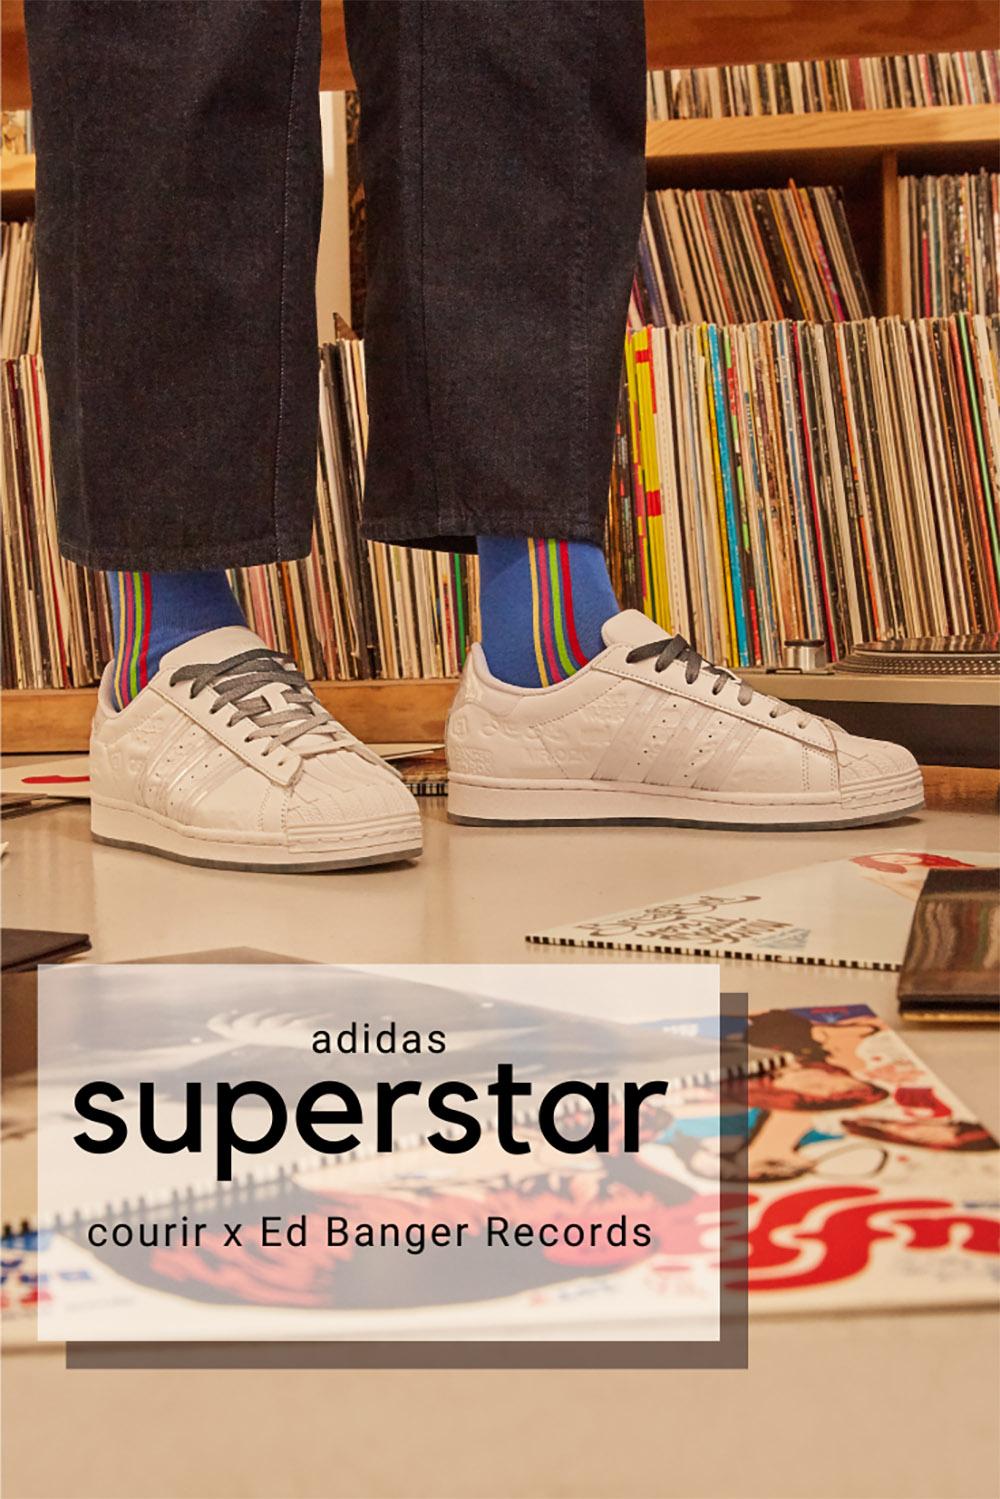 Courir 40 ans x Ed Banger Records x adidas Superstar